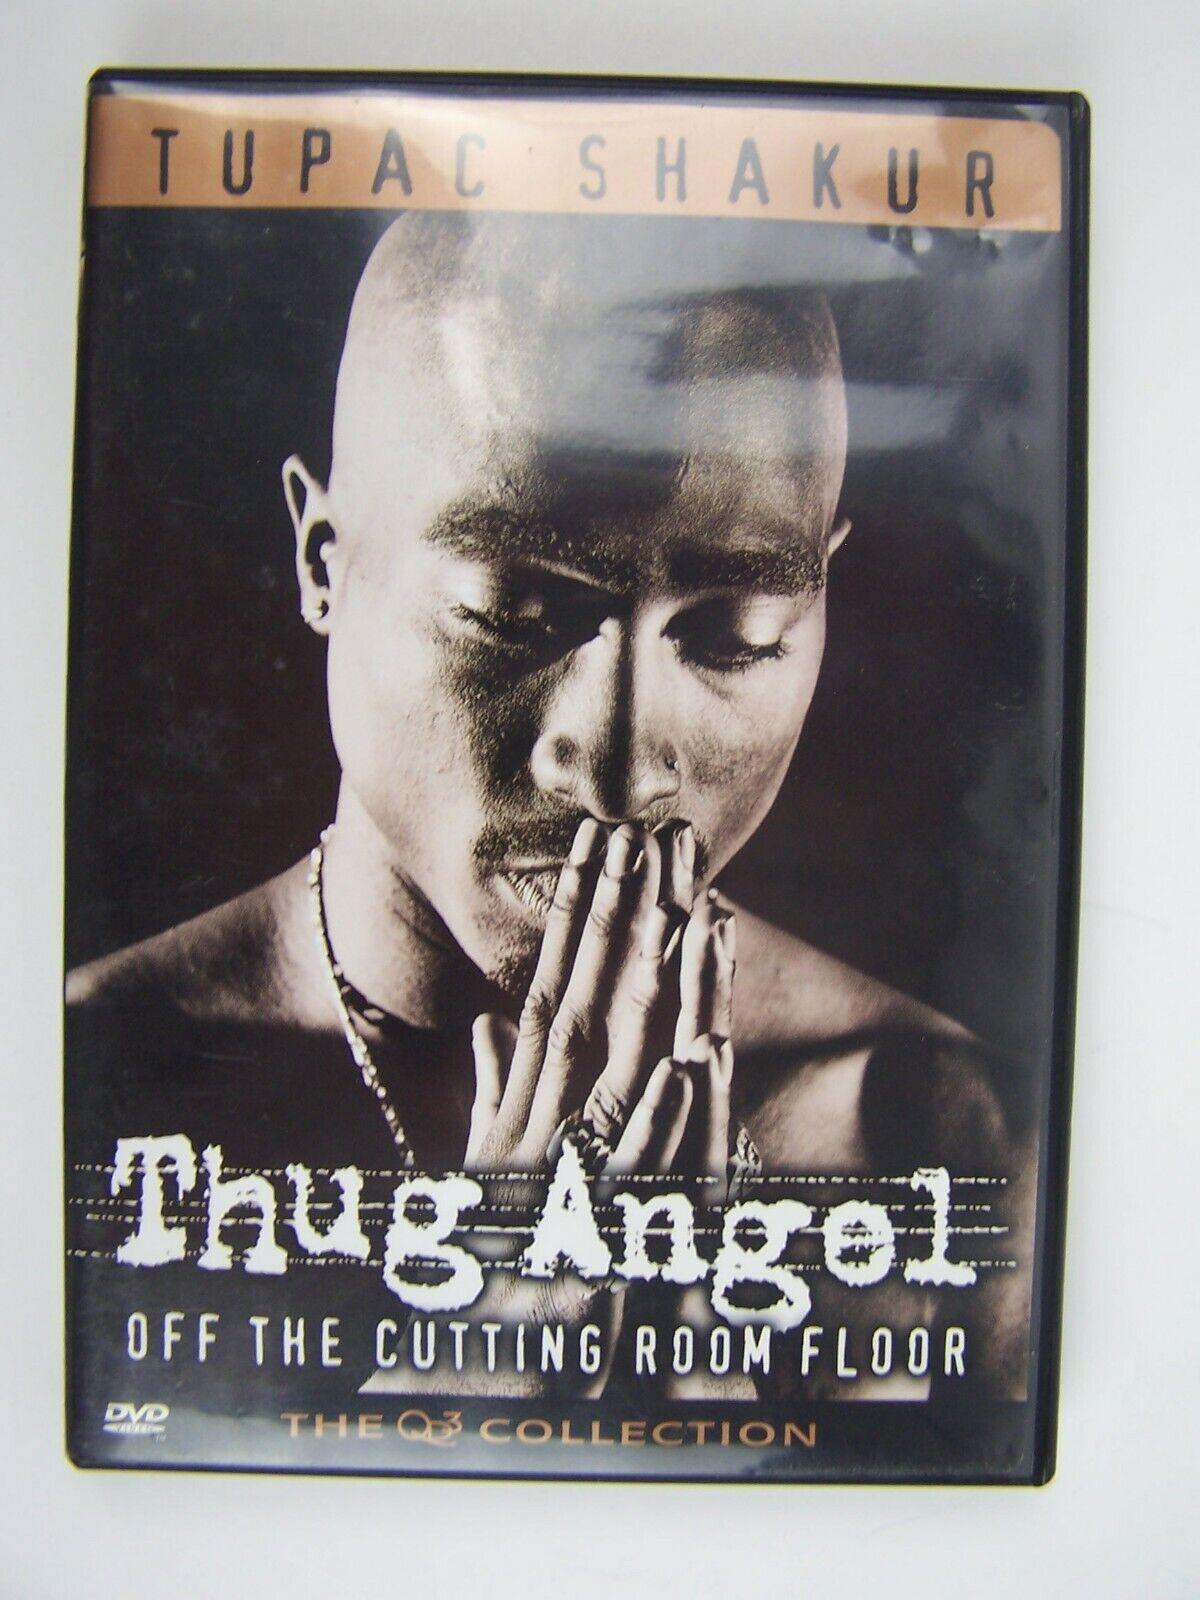 Tupac Shakur Thug Angel - Off the Cutting Room Floor Bo